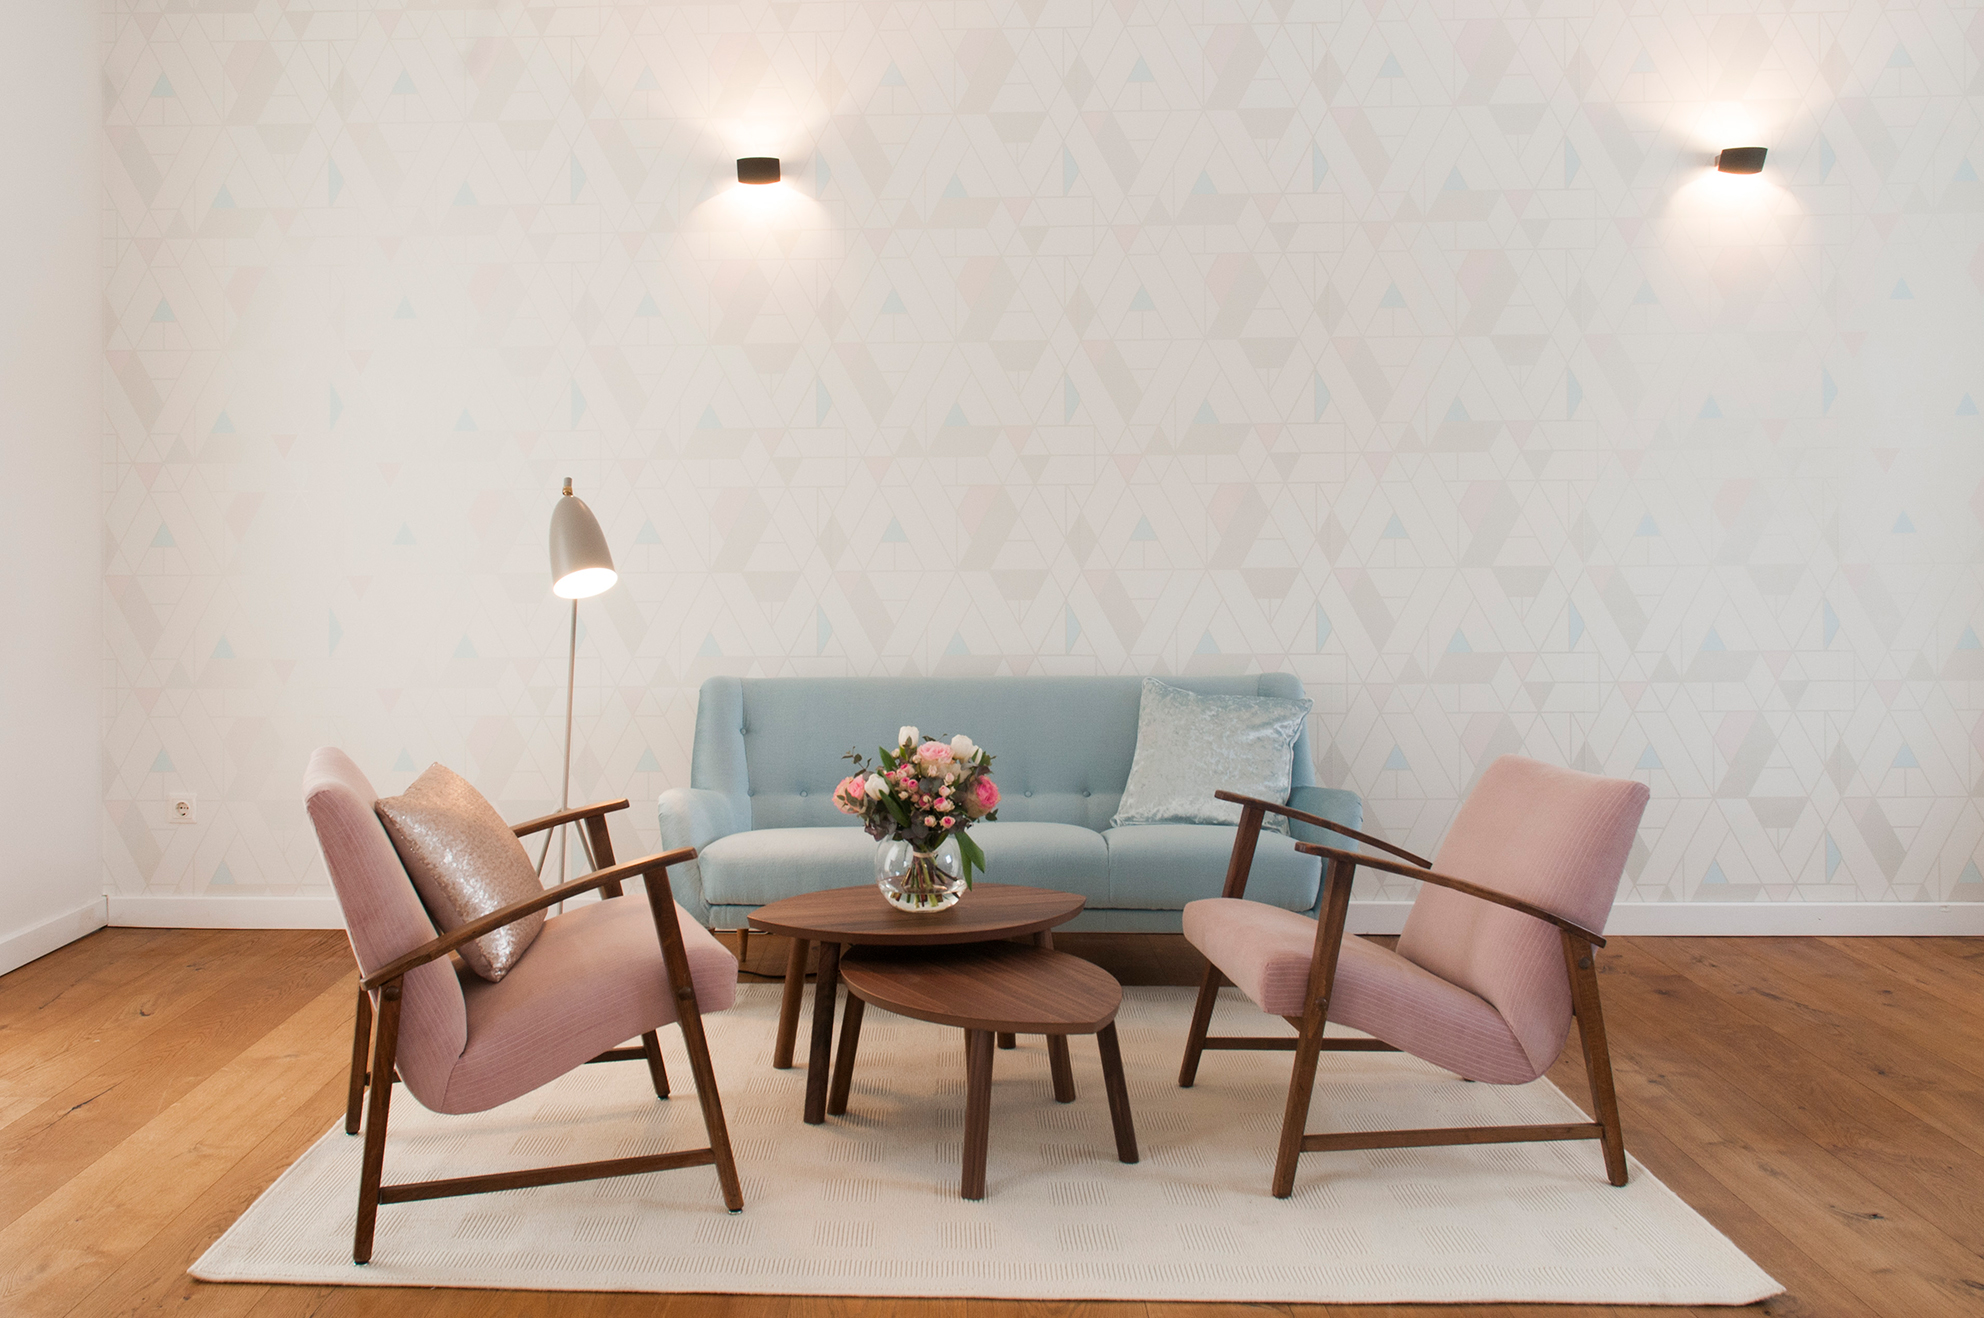 zimmerkuechekabinett_raumgestaltung_interiordesign